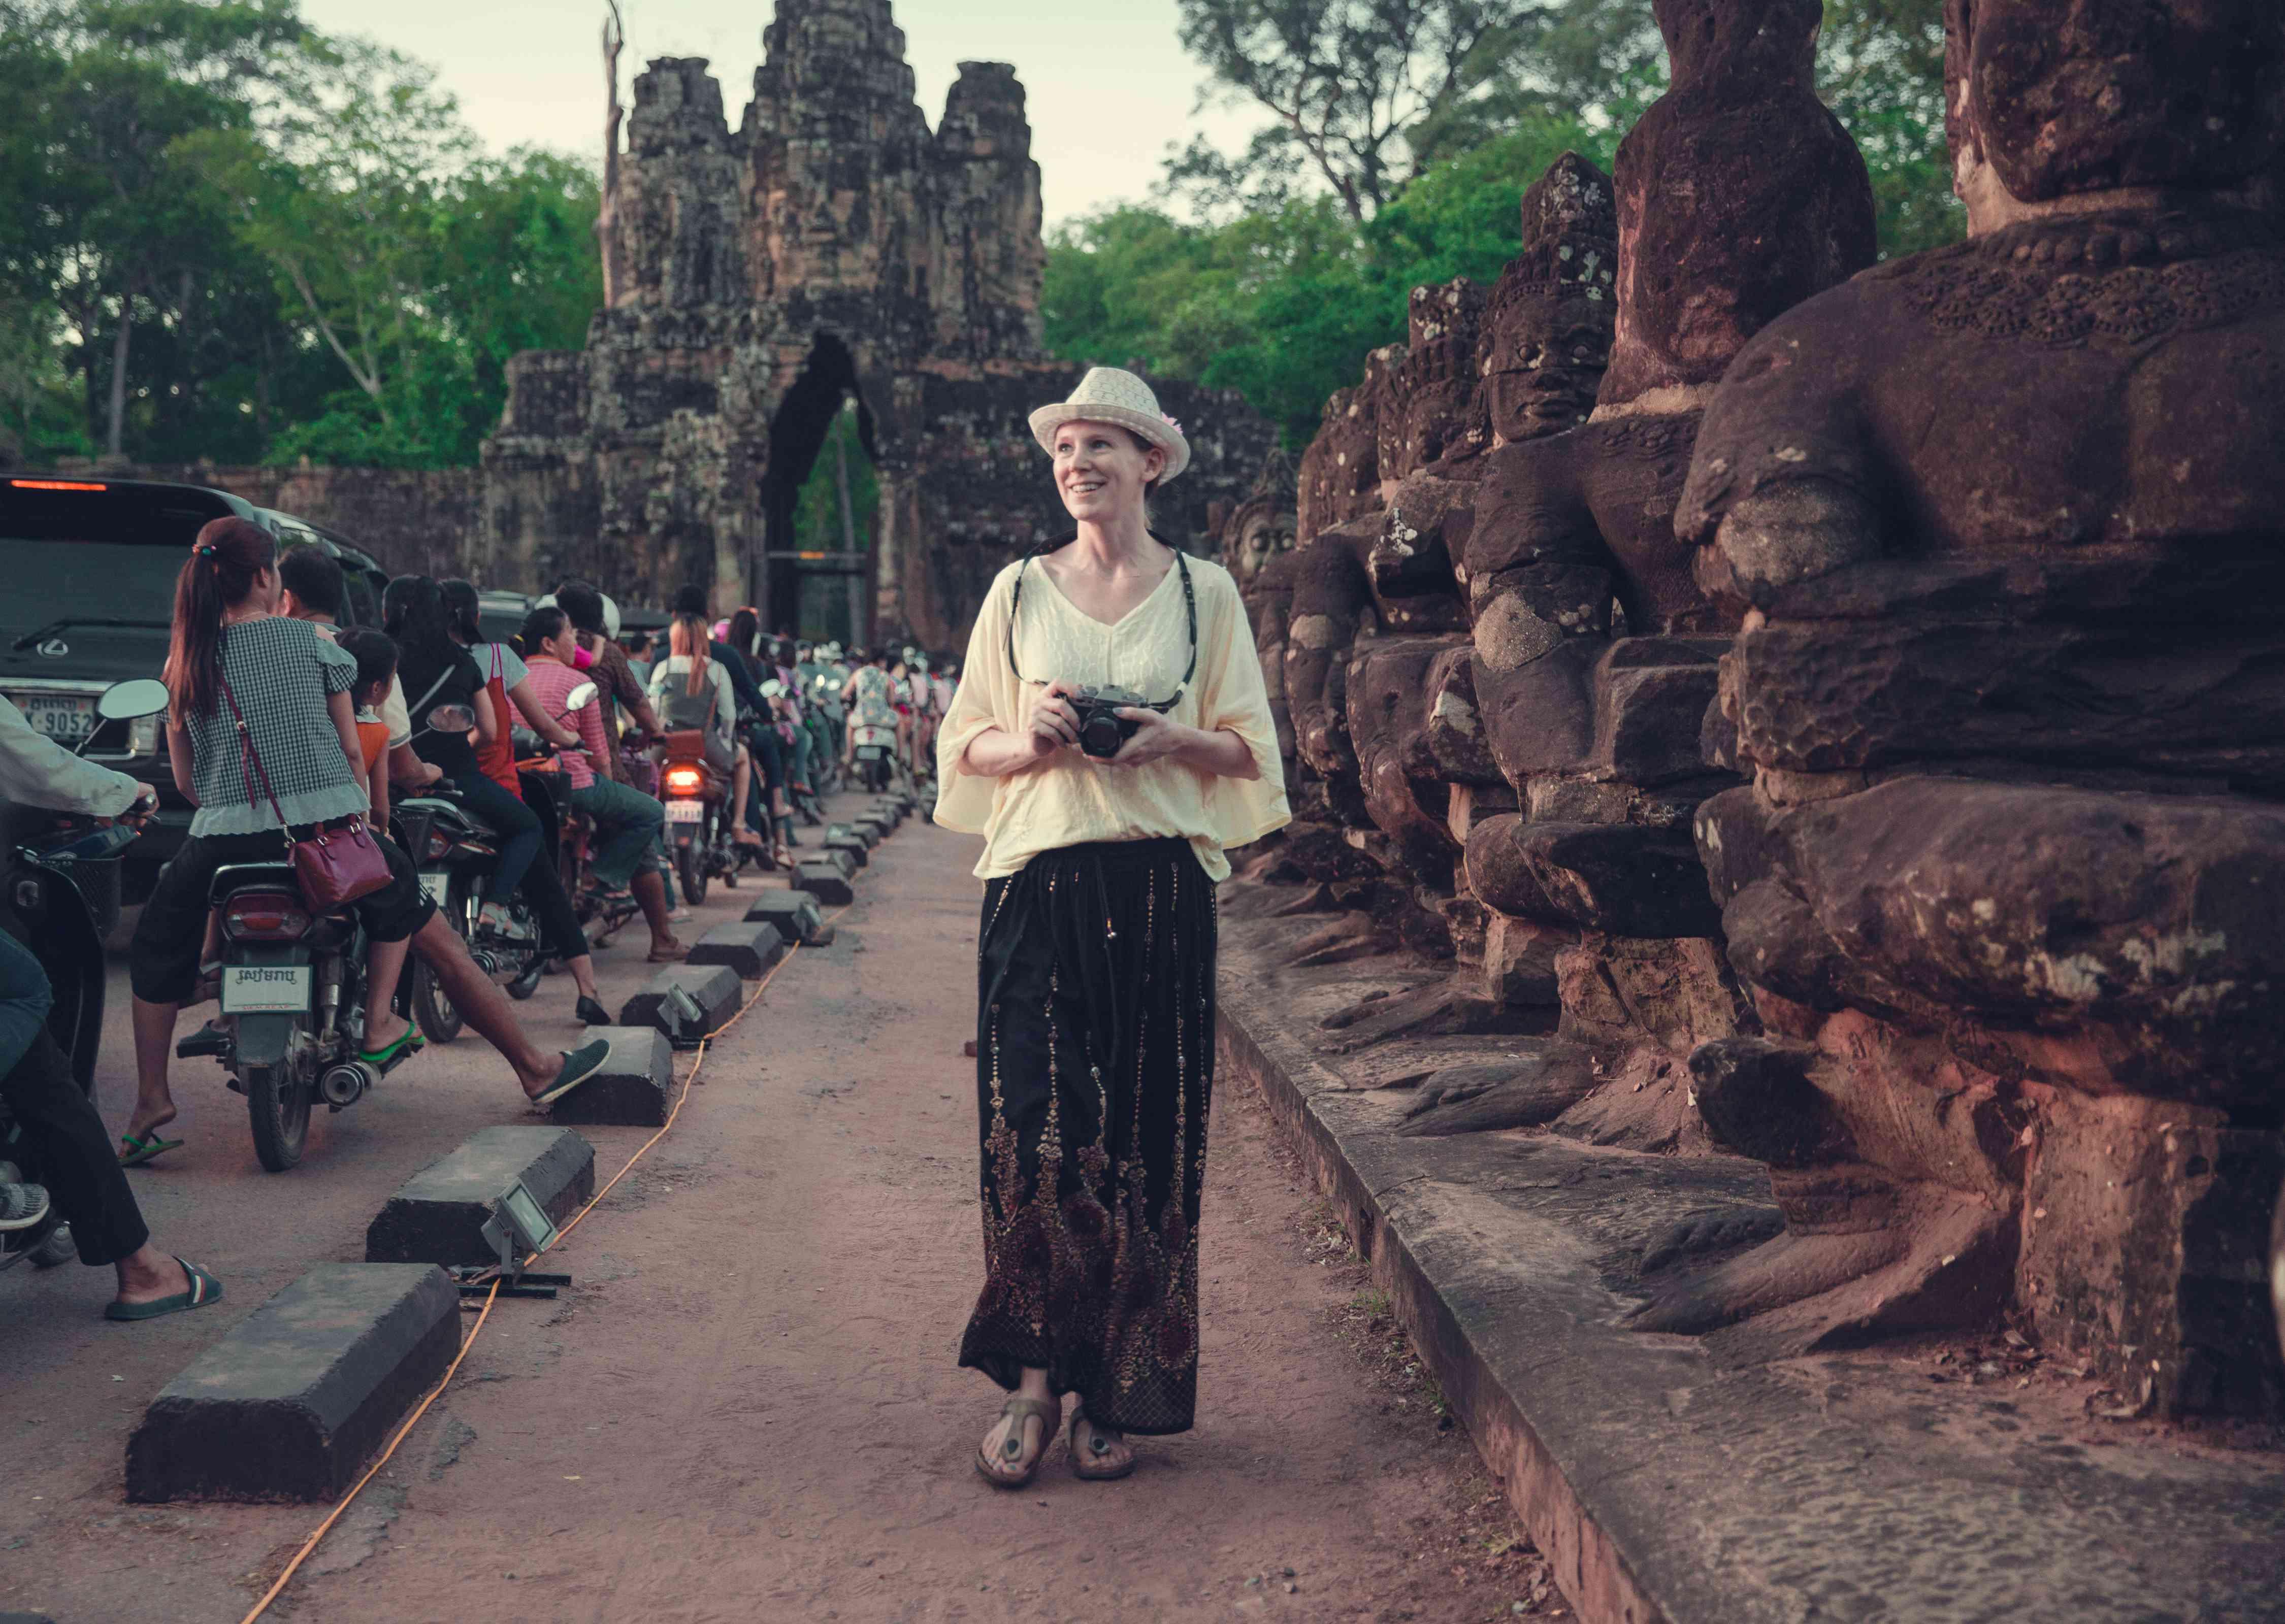 A female traveler walks a busy street in Cambodia